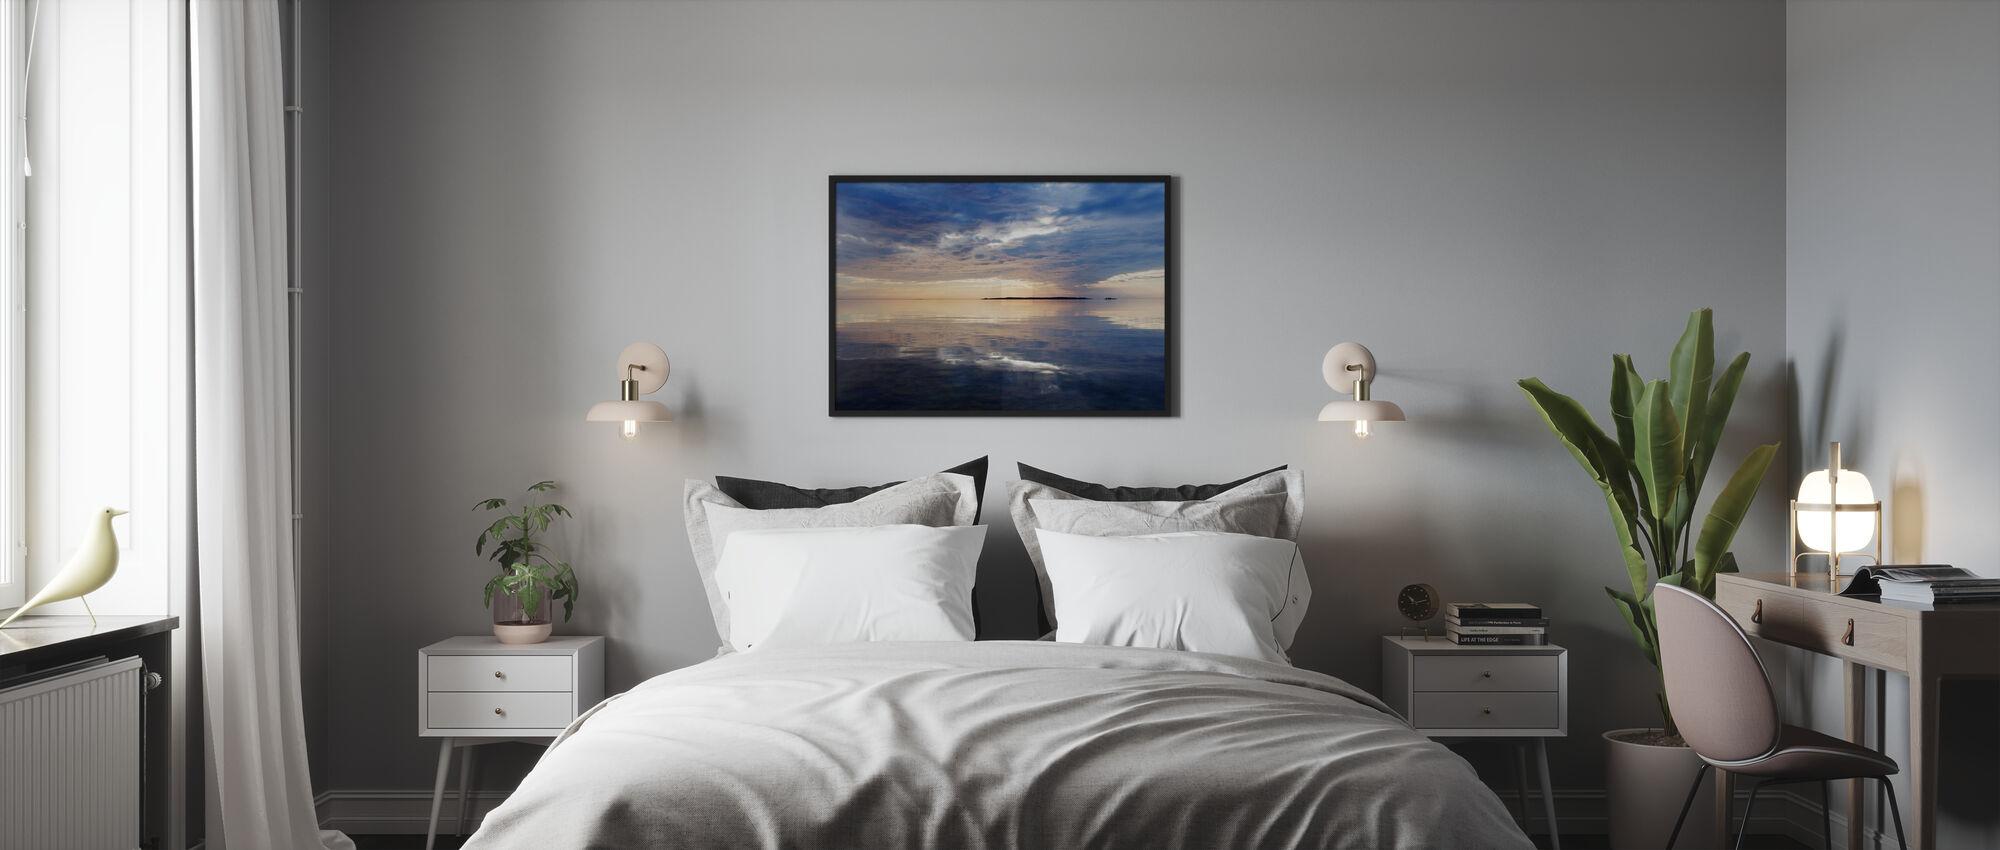 Sky Mirrored in Baltic Sea - Framed print - Bedroom